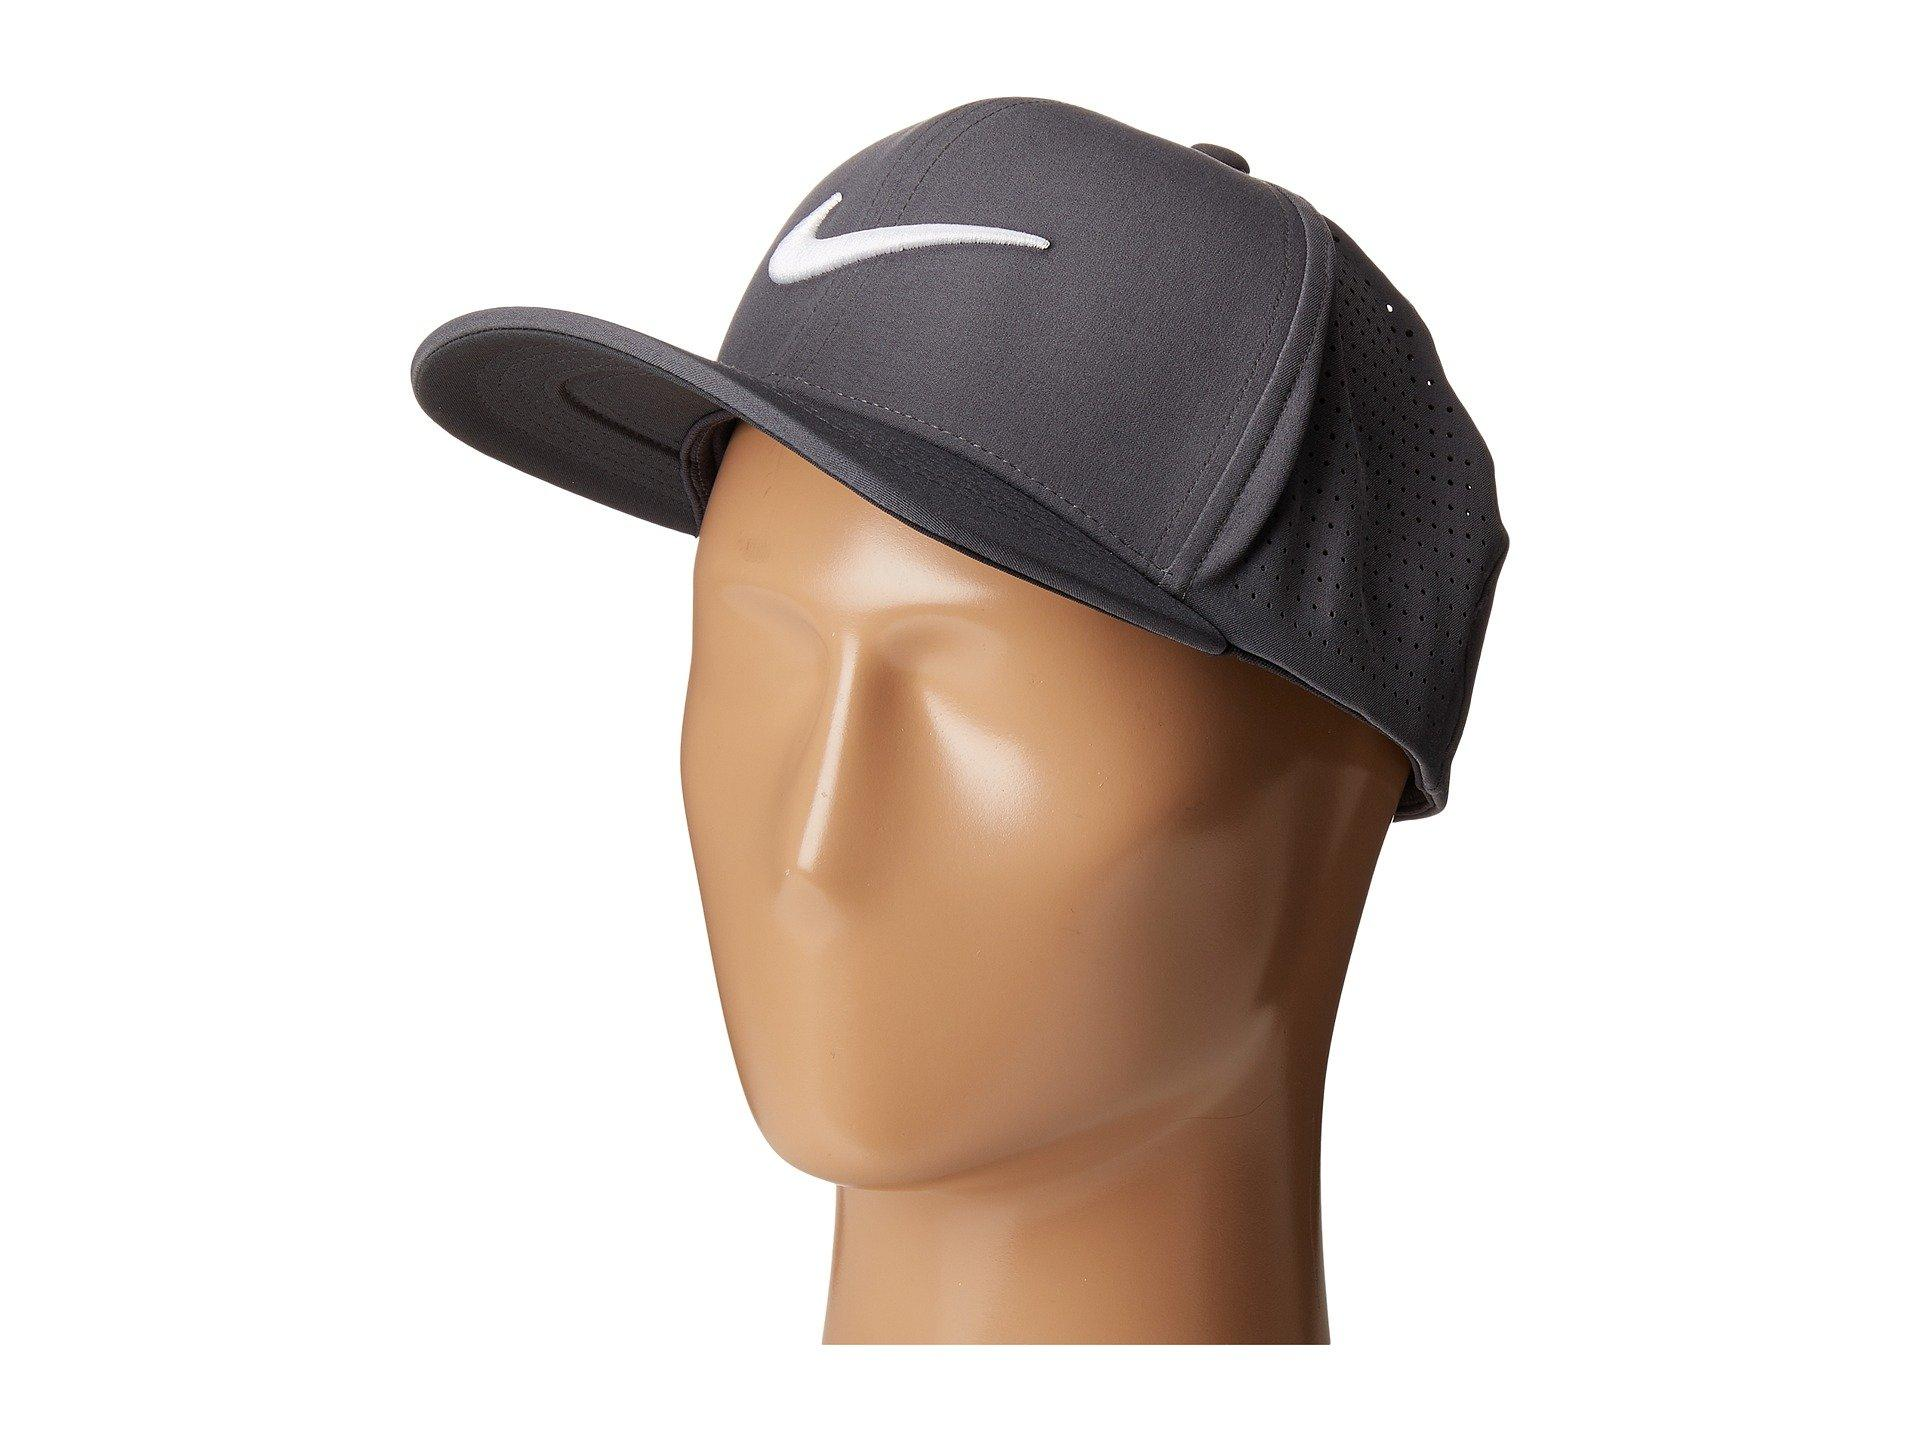 Nike Classic99 Perf Cap In Dark Grey/Anthracite/White